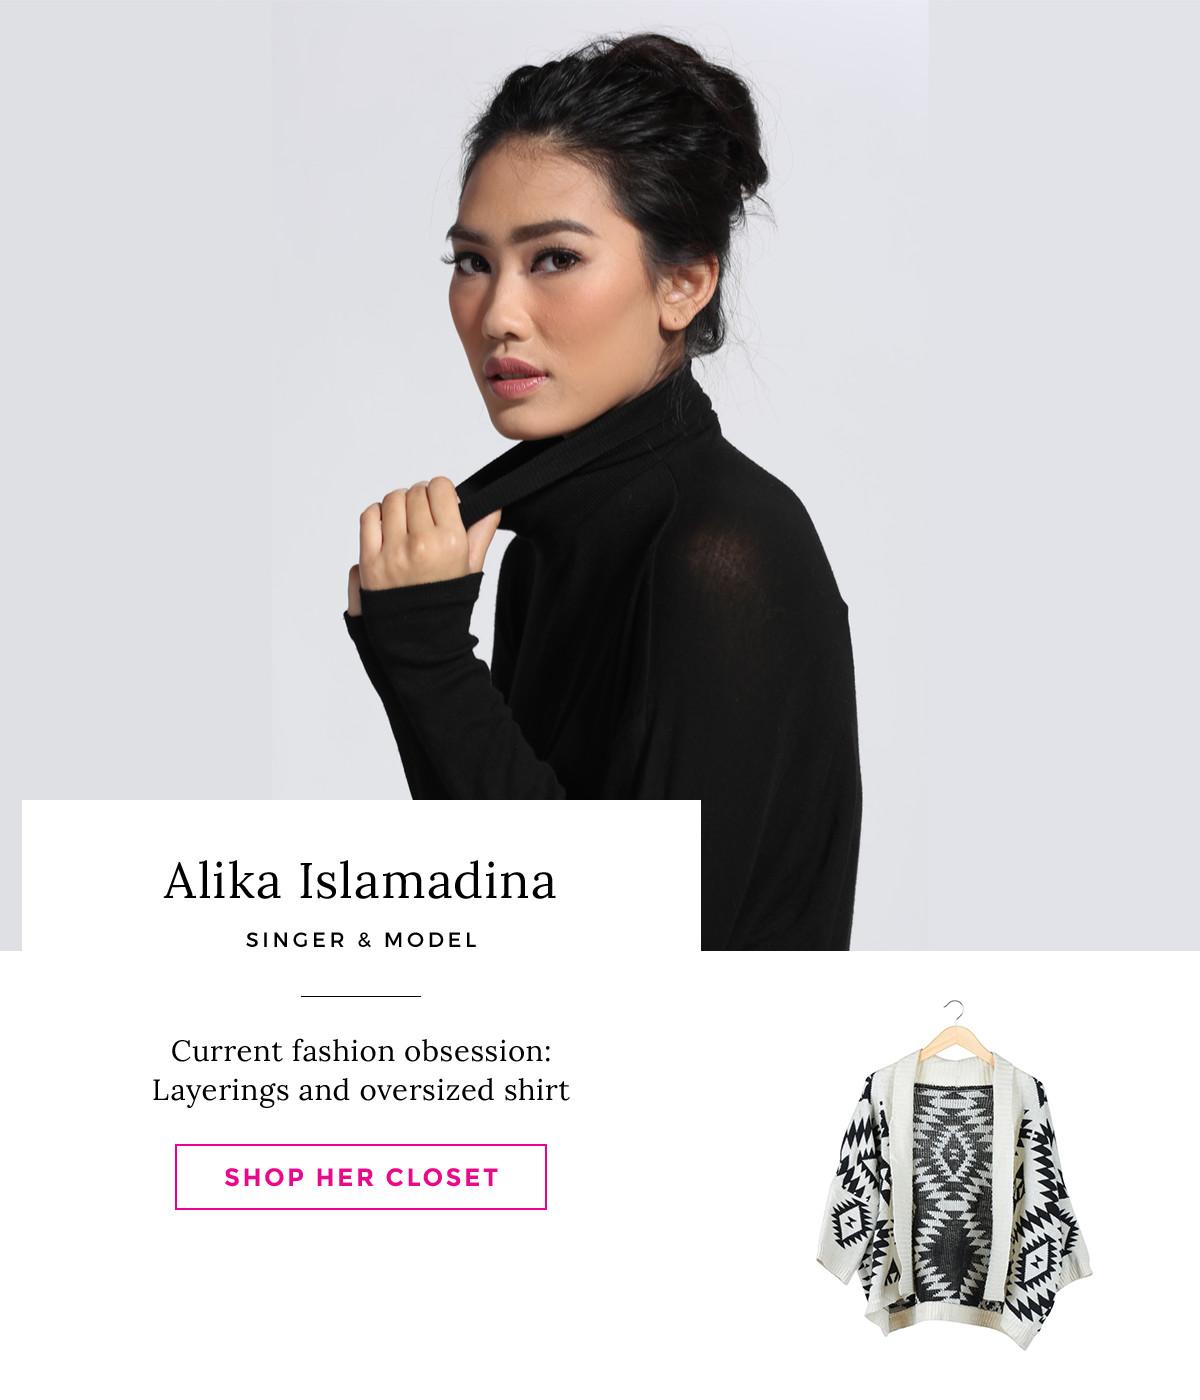 Alika Islamadina